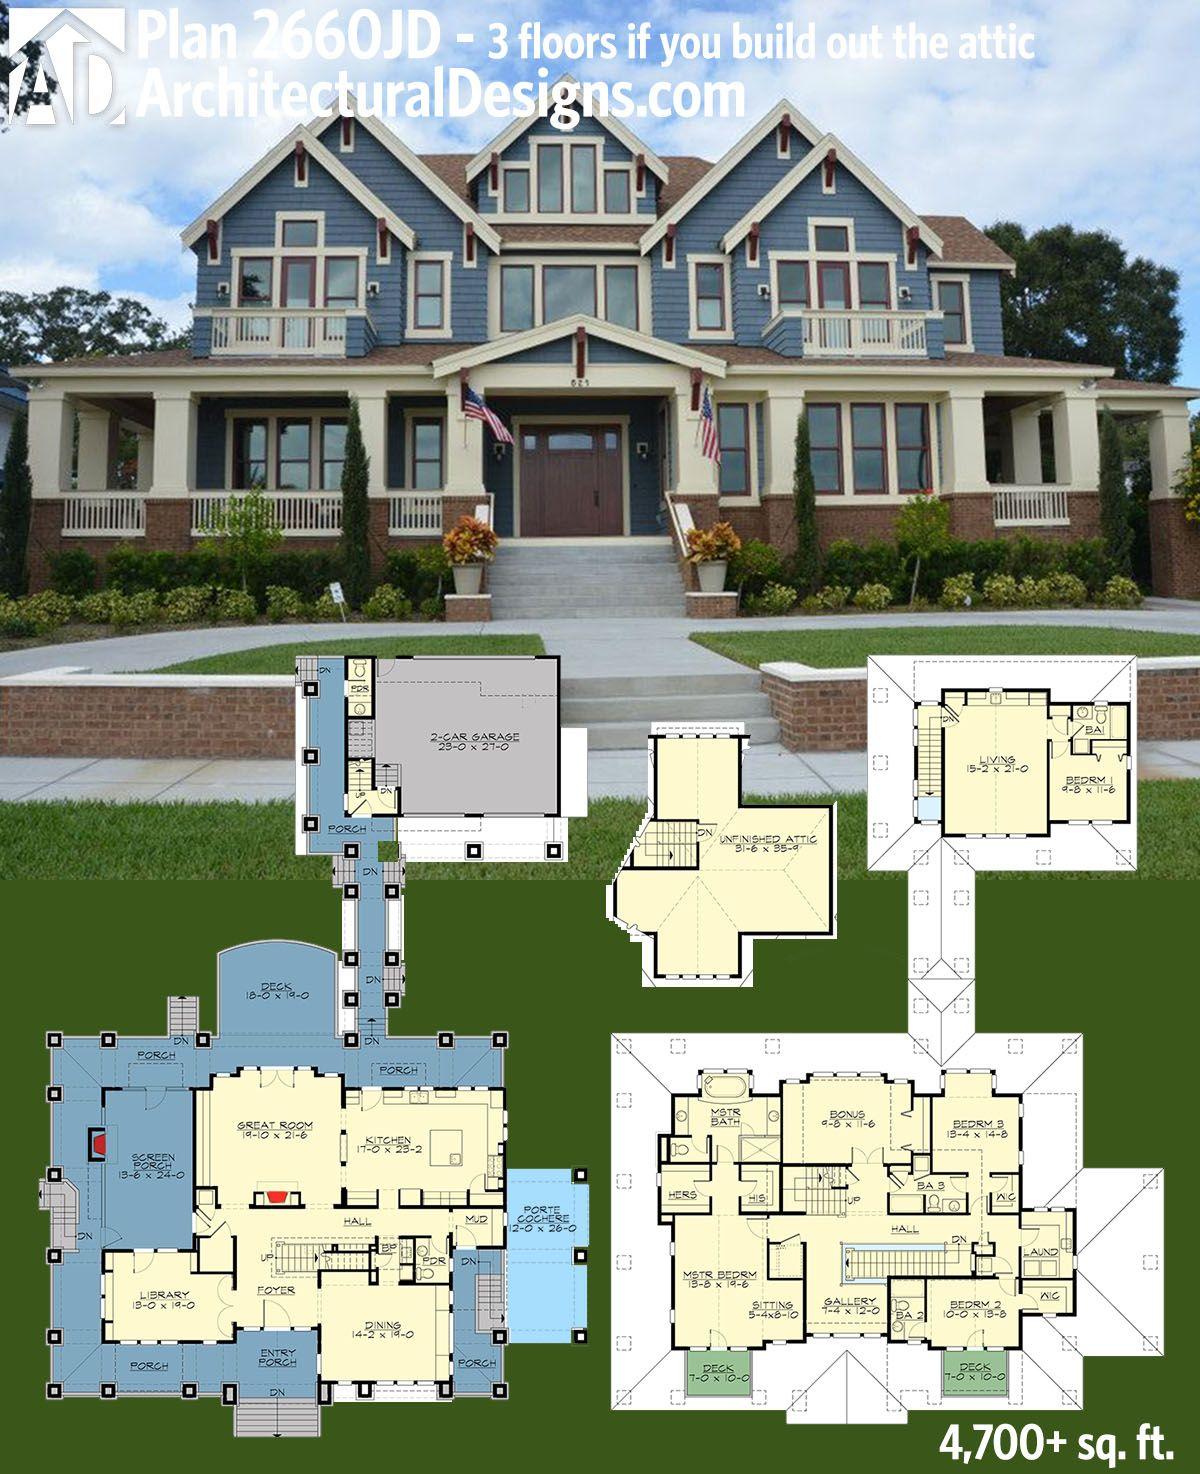 Garage Apartment Floor Plans Do Yourself plan 23660jd: stylish northwest house plan with garage apartment